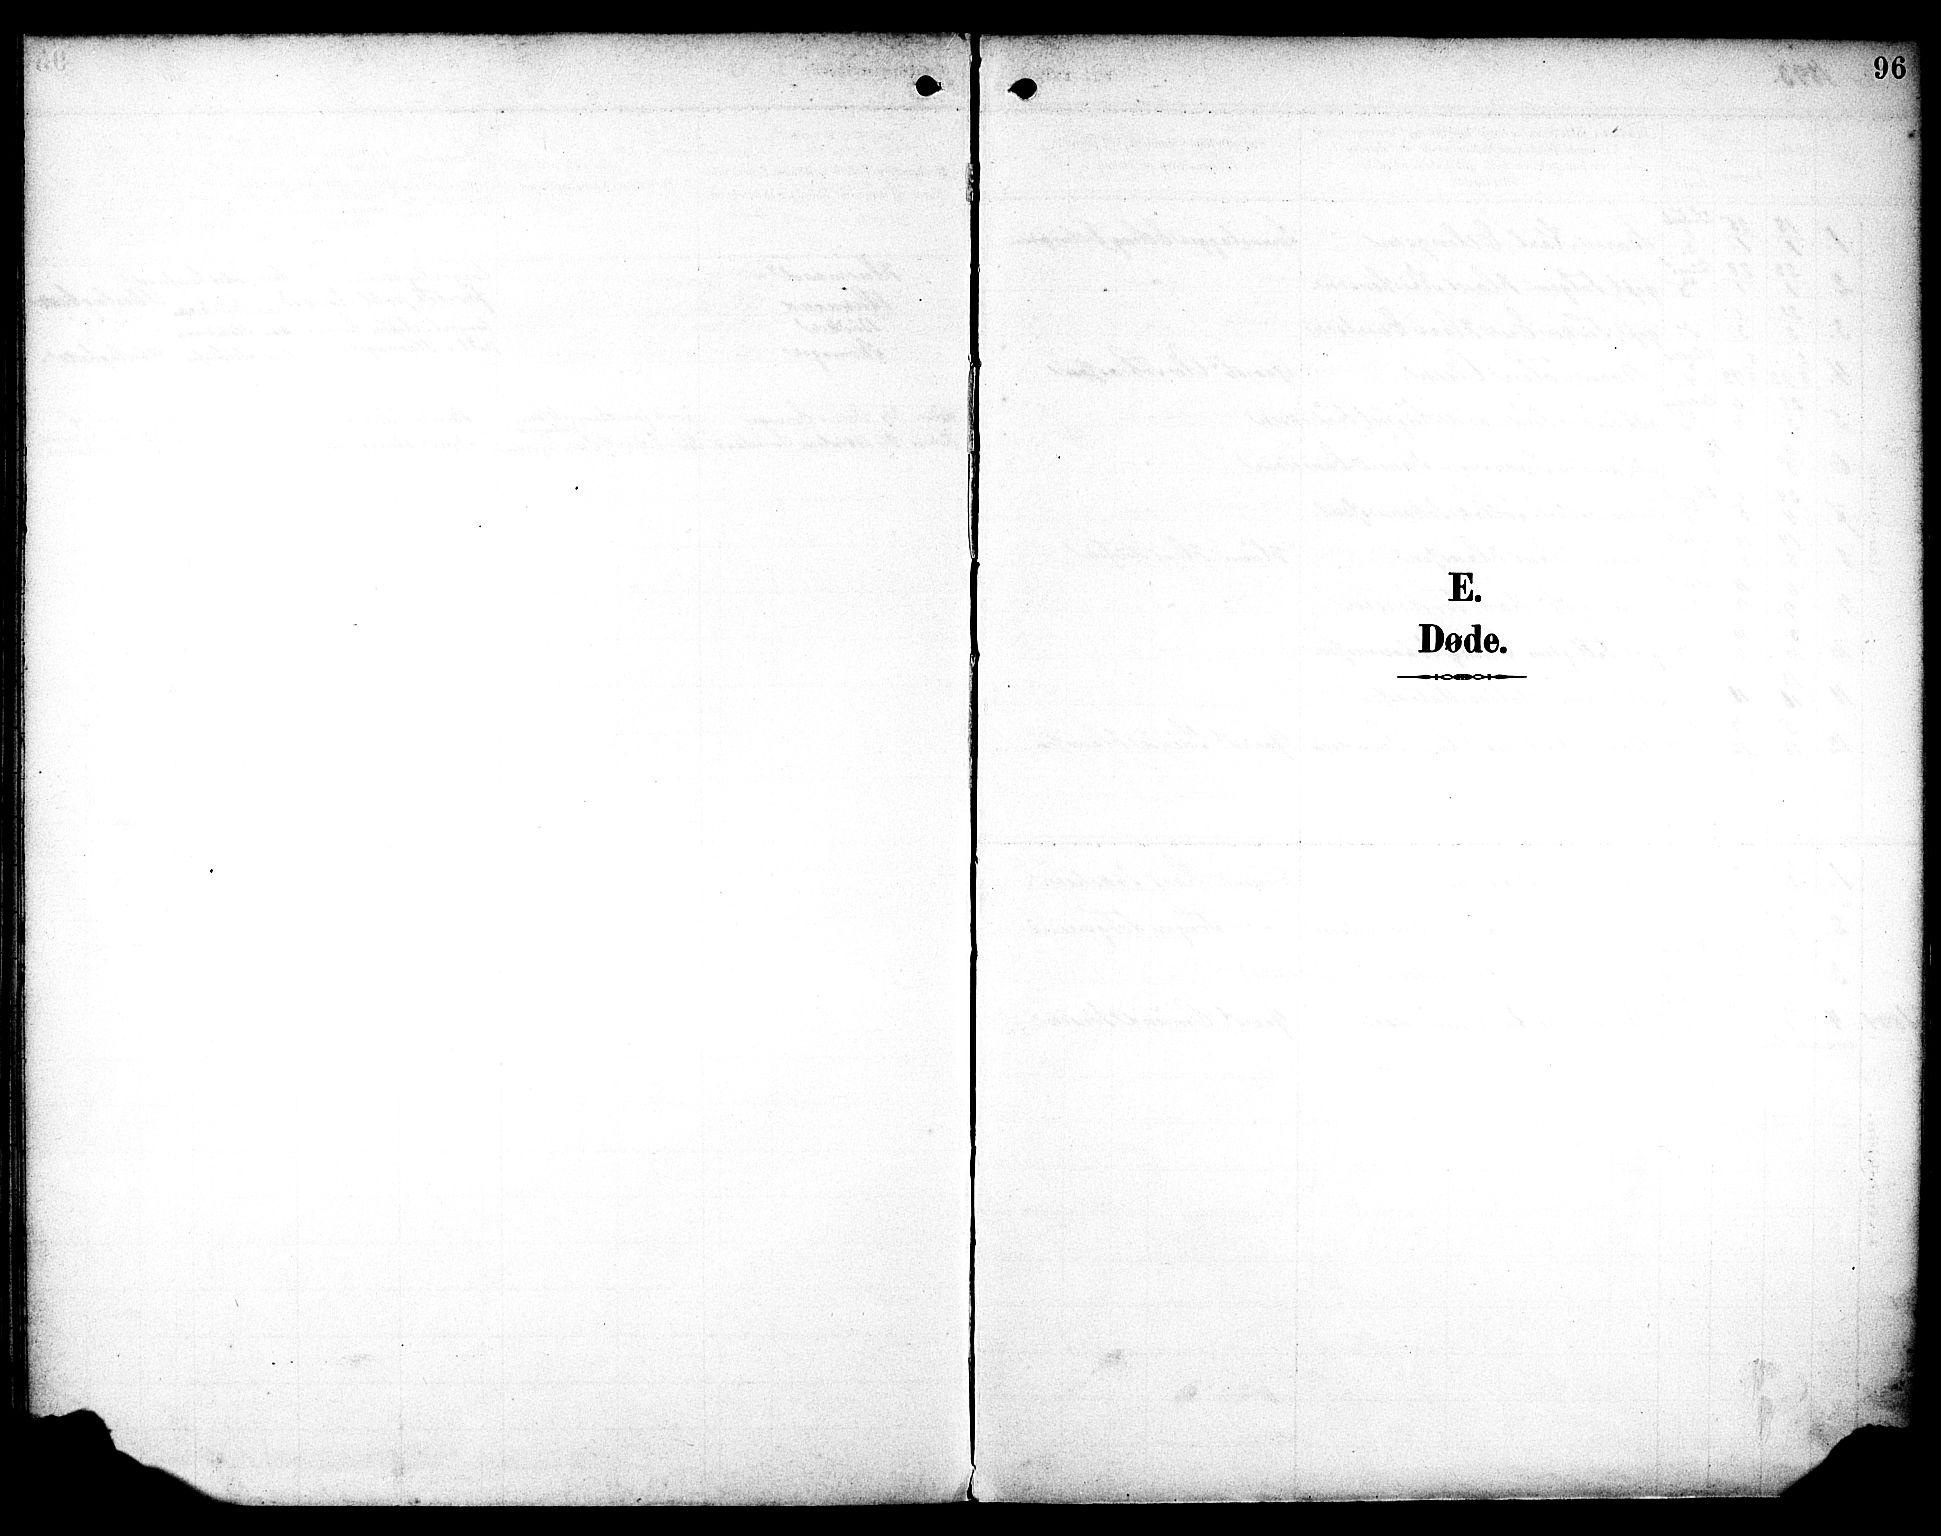 SAST, Egersund sokneprestkontor, Ministerialbok nr. A 19, 1893-1910, s. 96